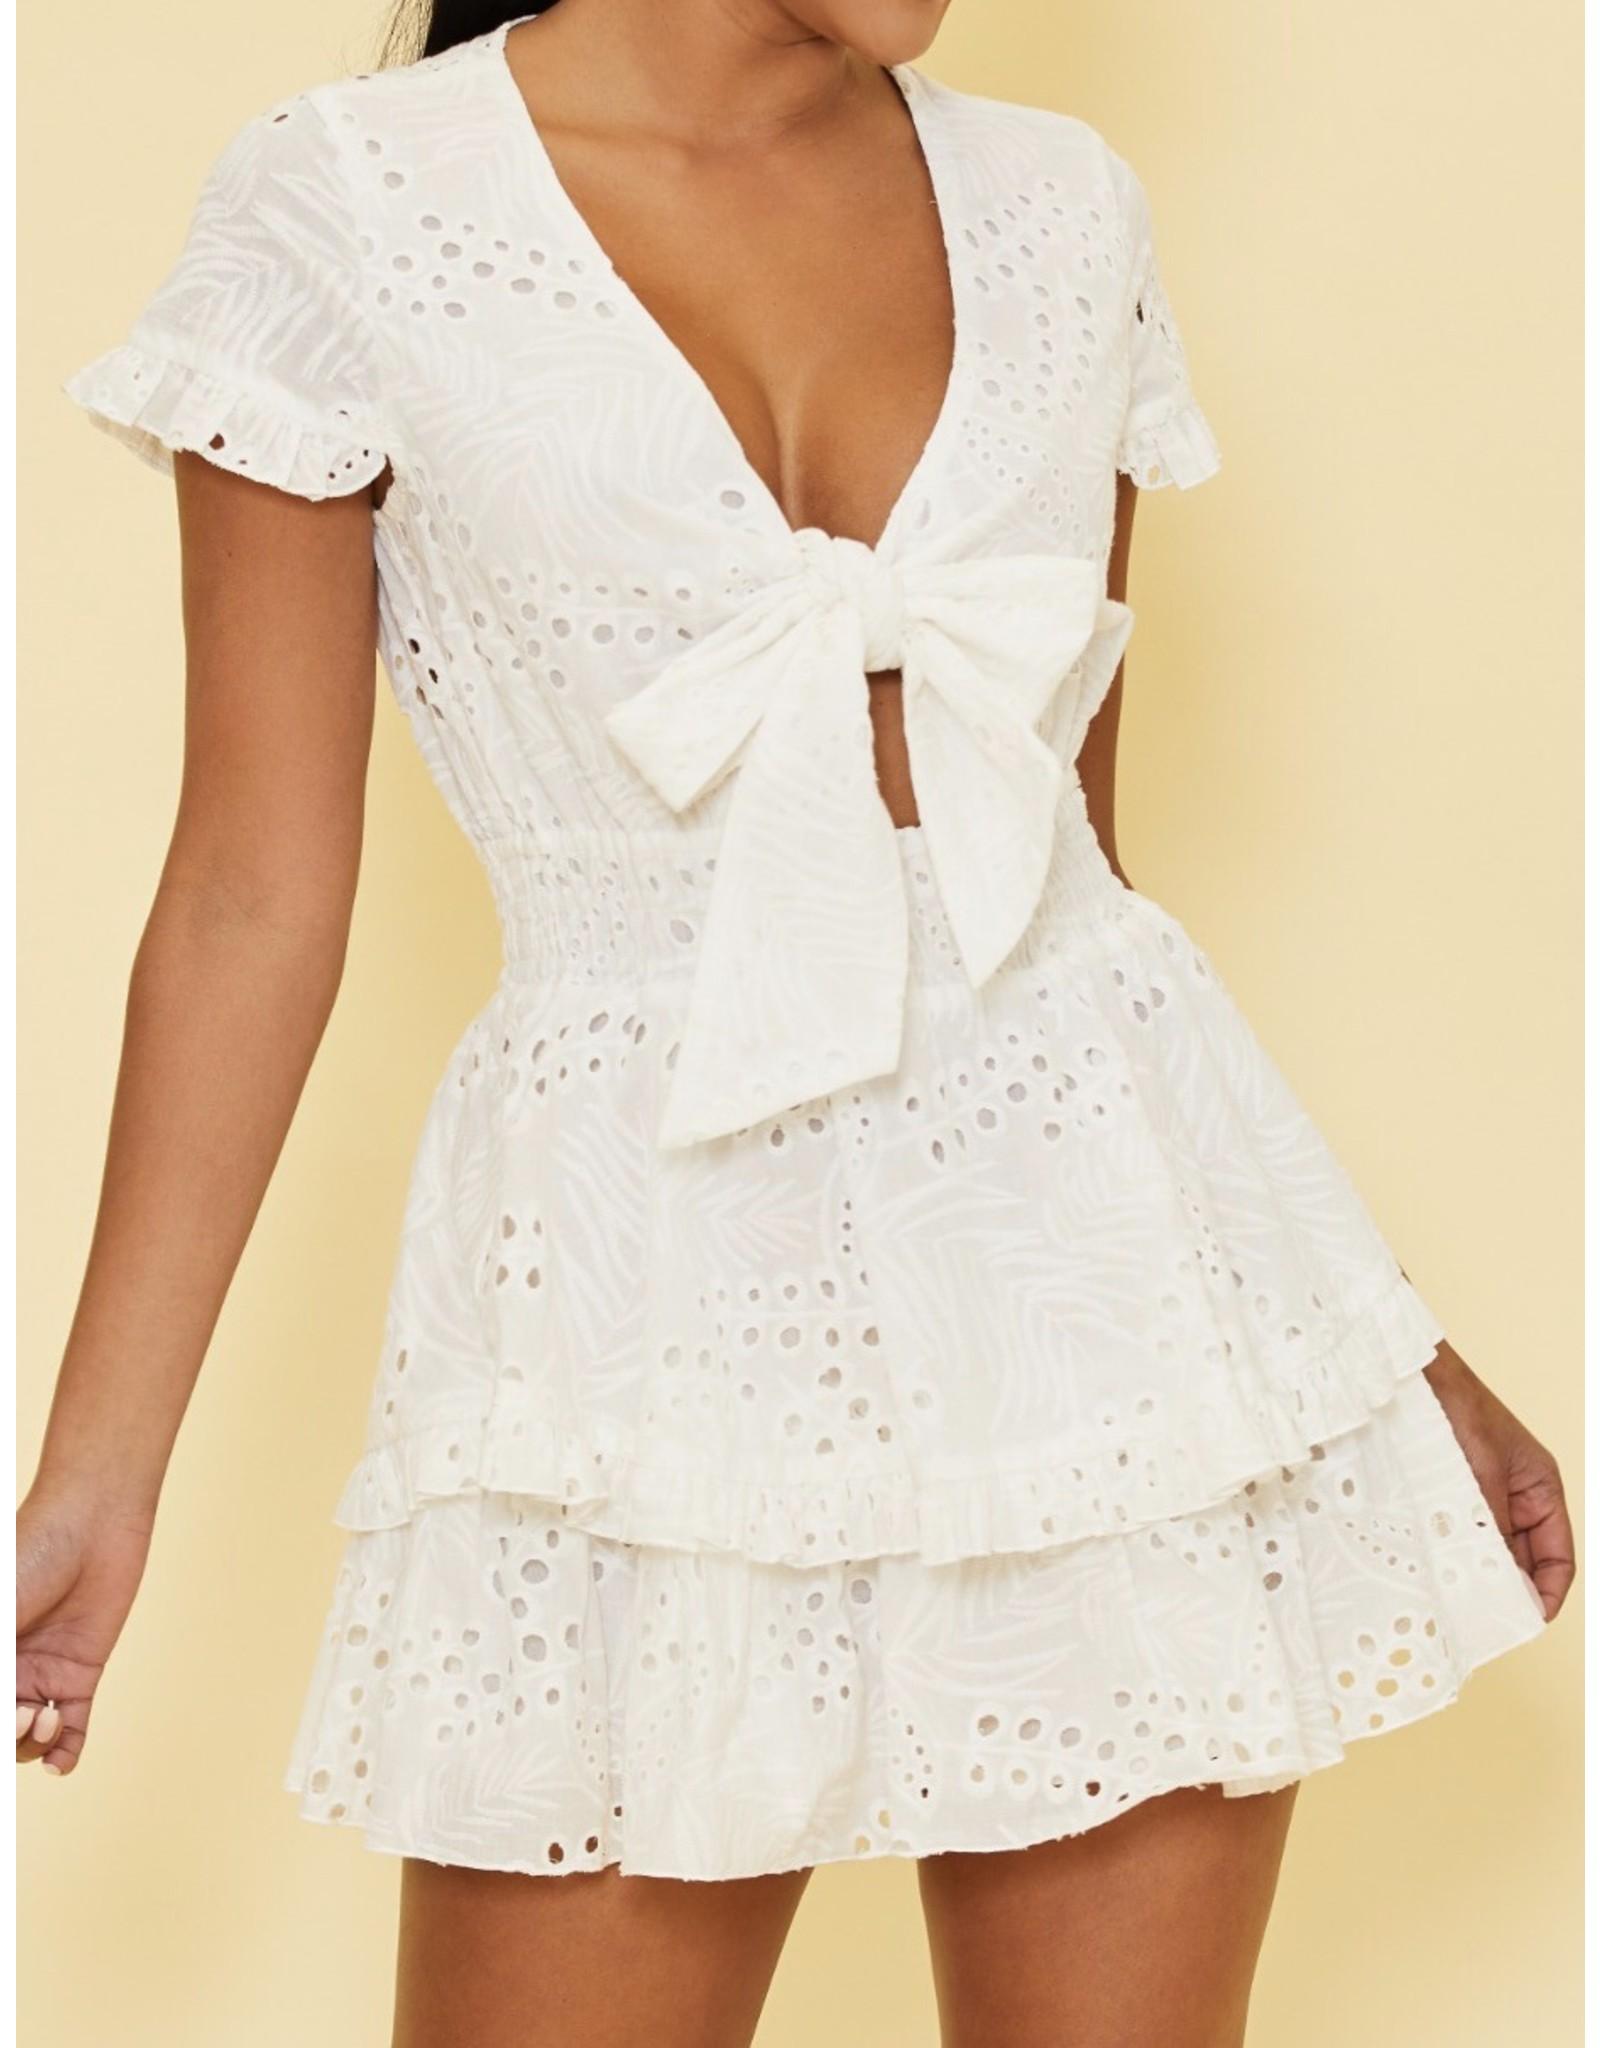 Tie Front Eyelet Dress - White